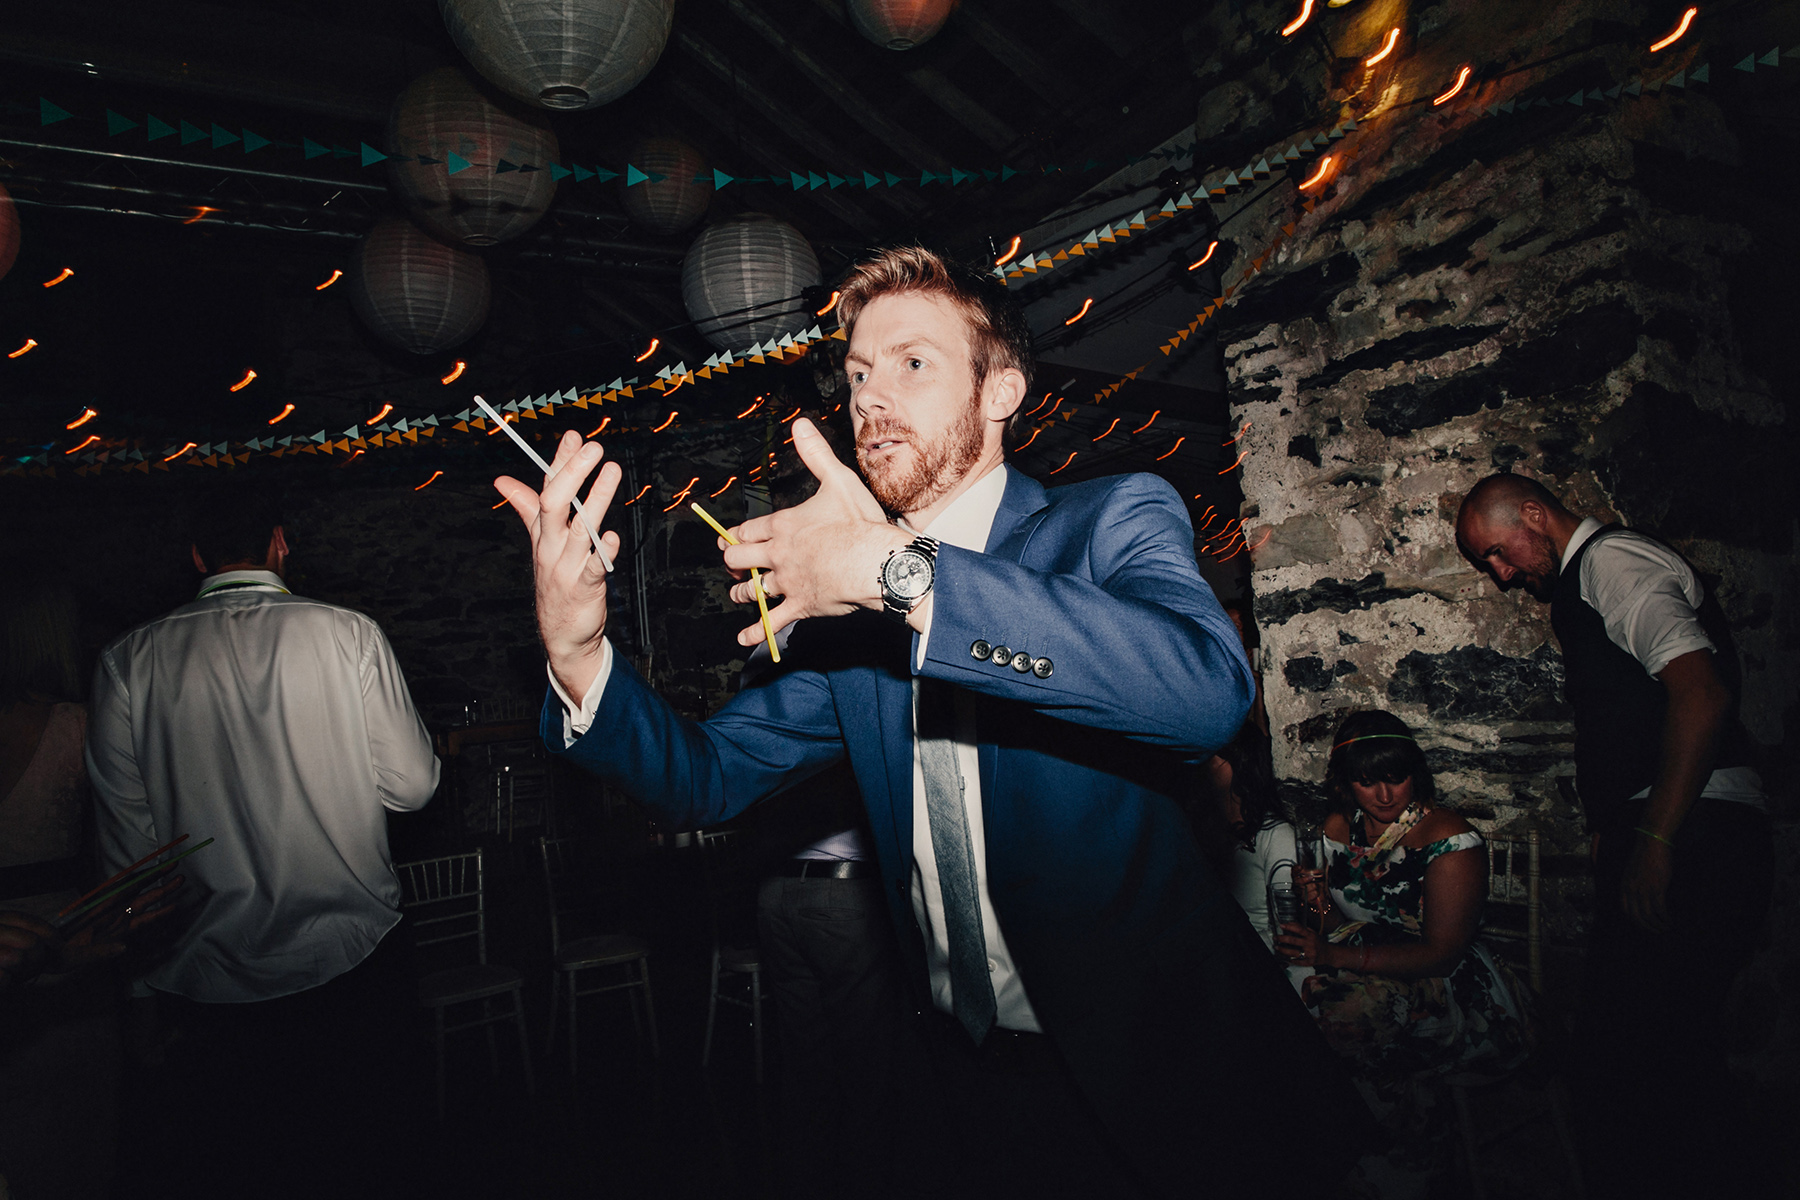 Snowdonia-Wales-Wedding-Photos-0421.jpg